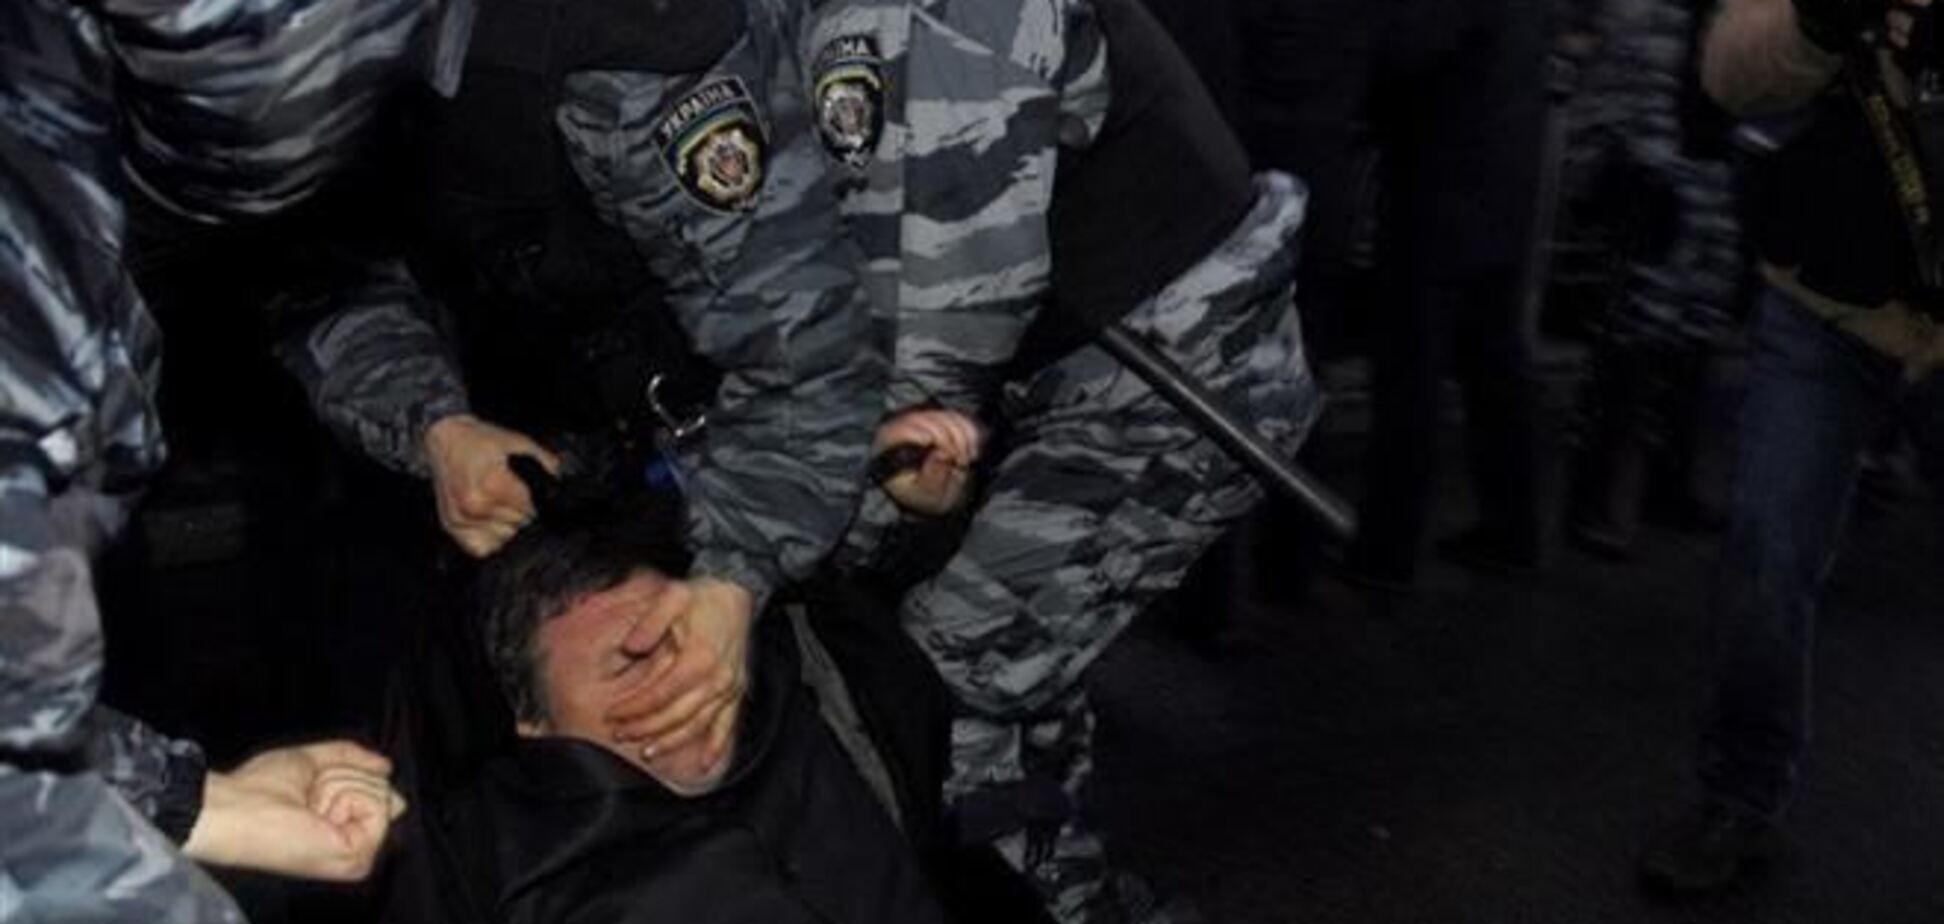 ГПУ собирает фото и видео с разгона Евромайдана